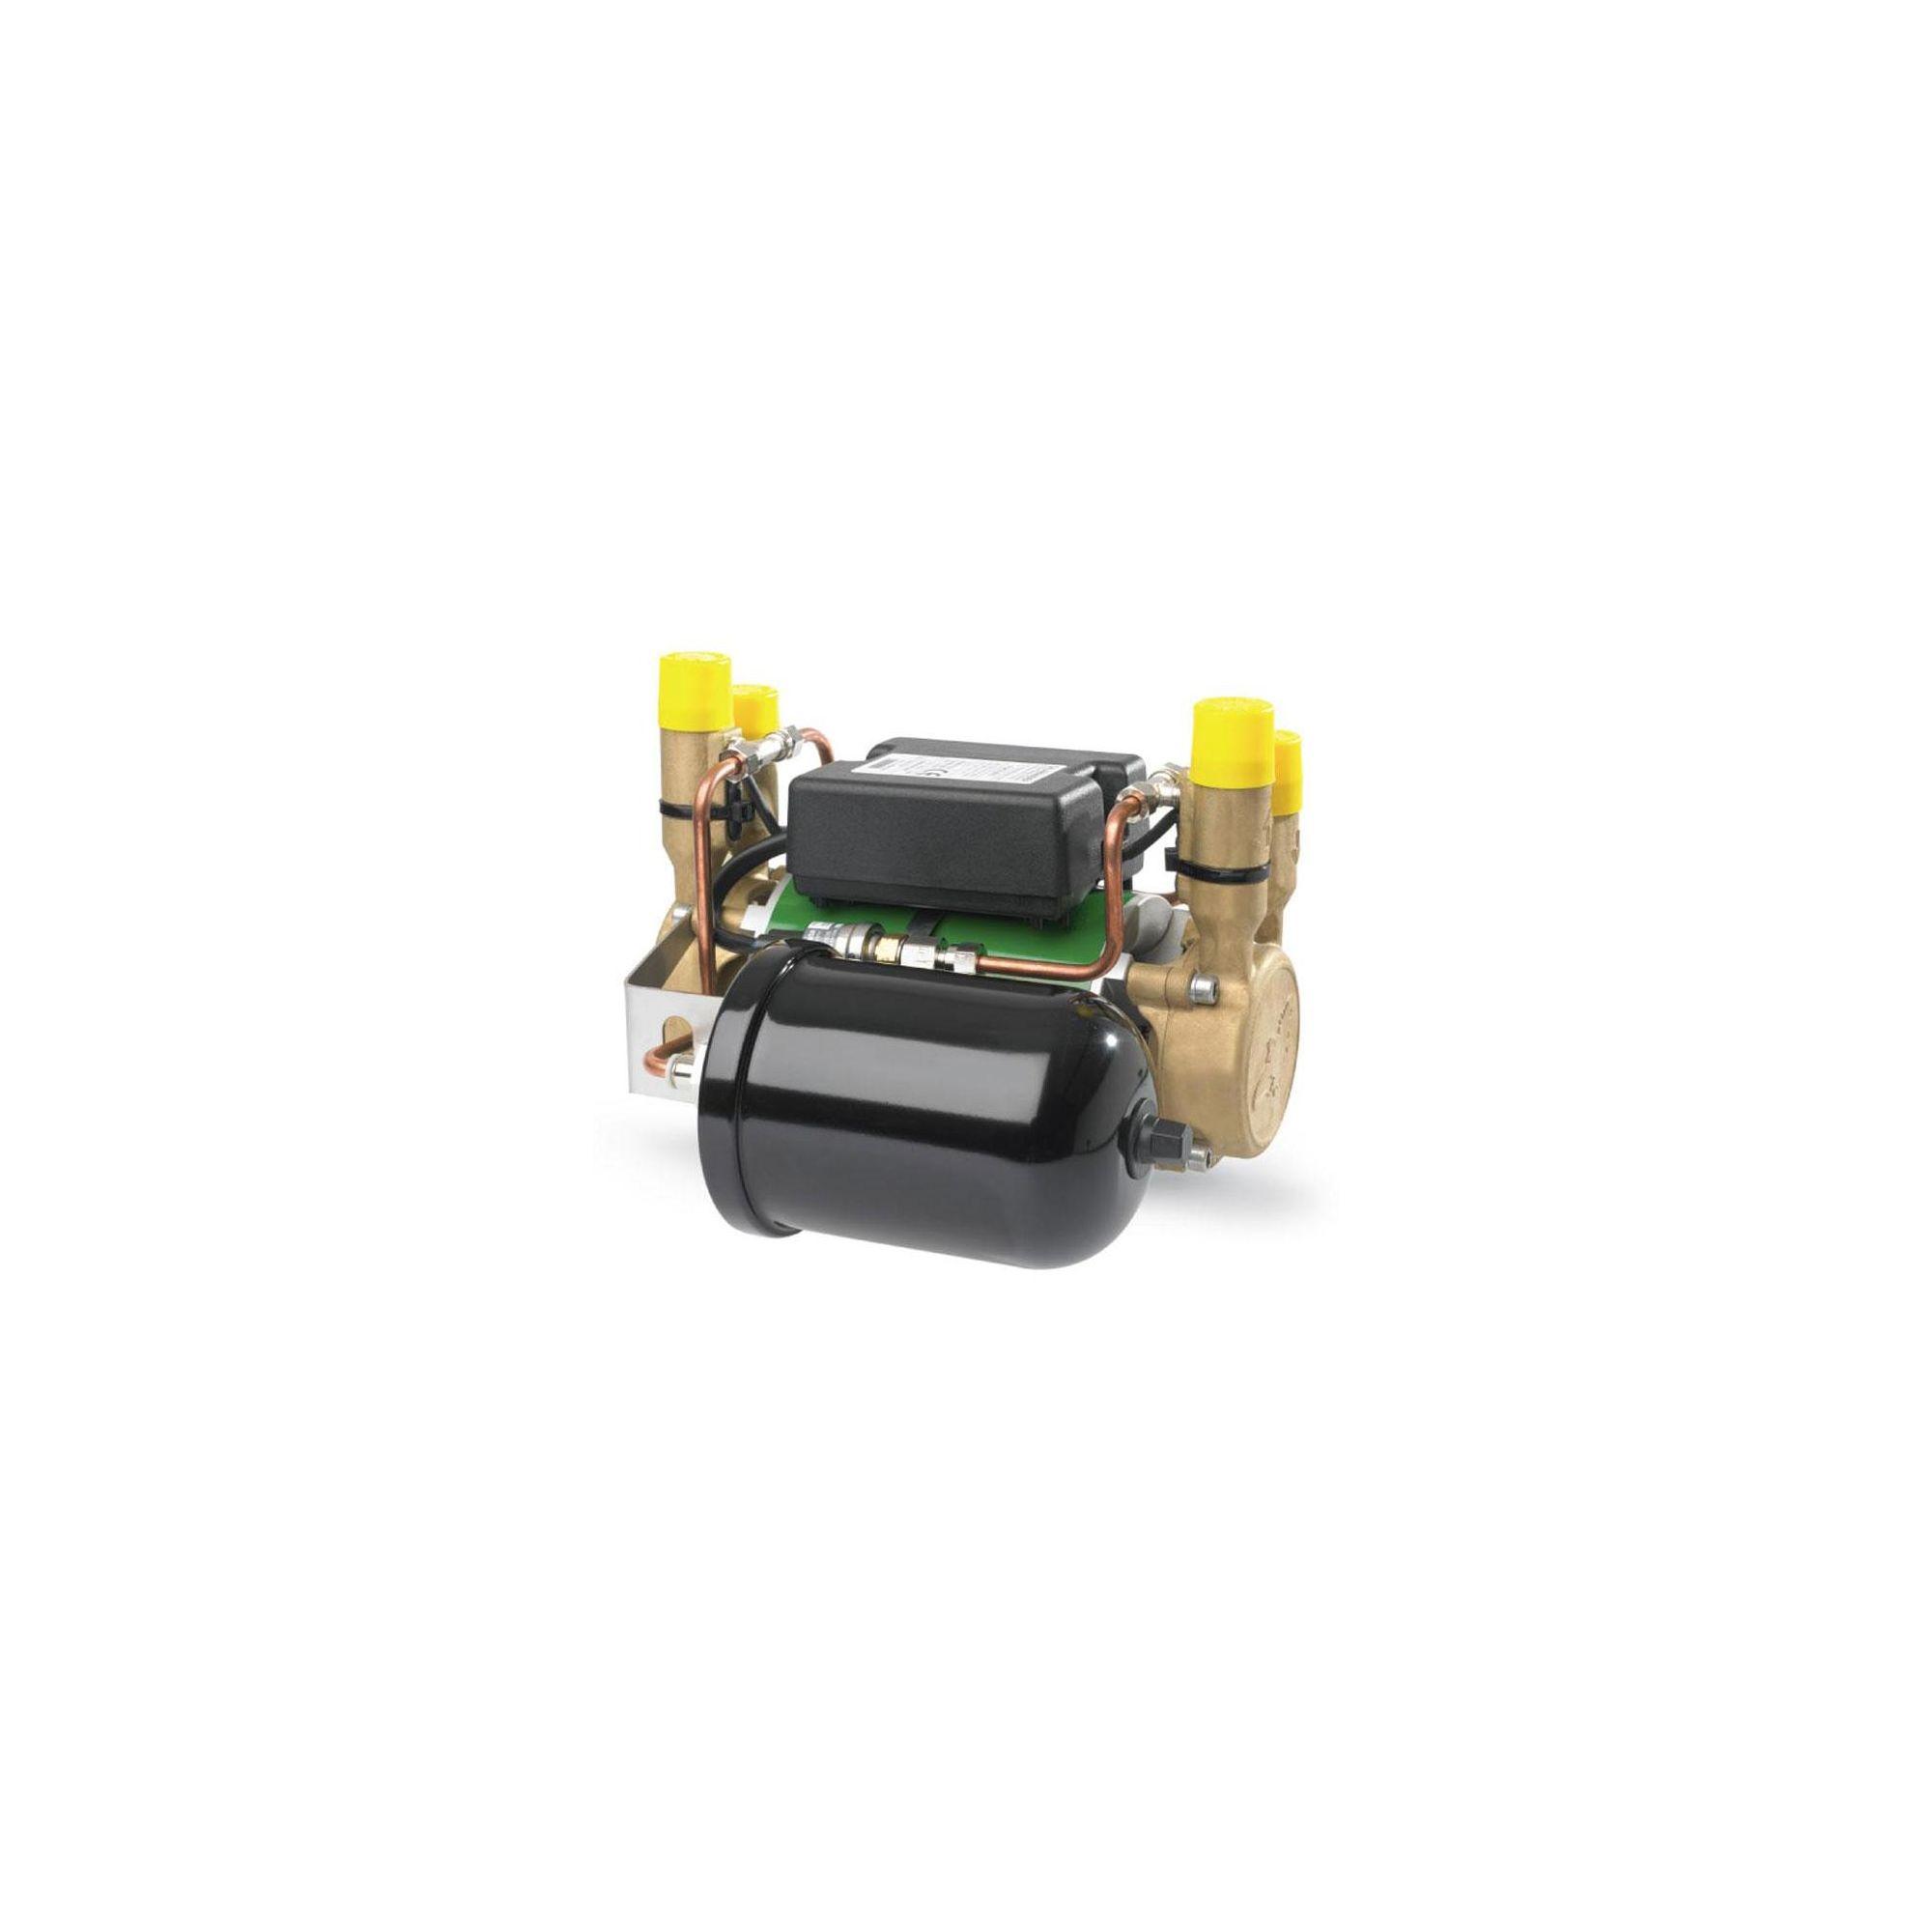 Salamander Force 30 TU Universal Twin Impeller Shower Pump, Positive or Negative Head, 3.0 Bar at Tesco Direct